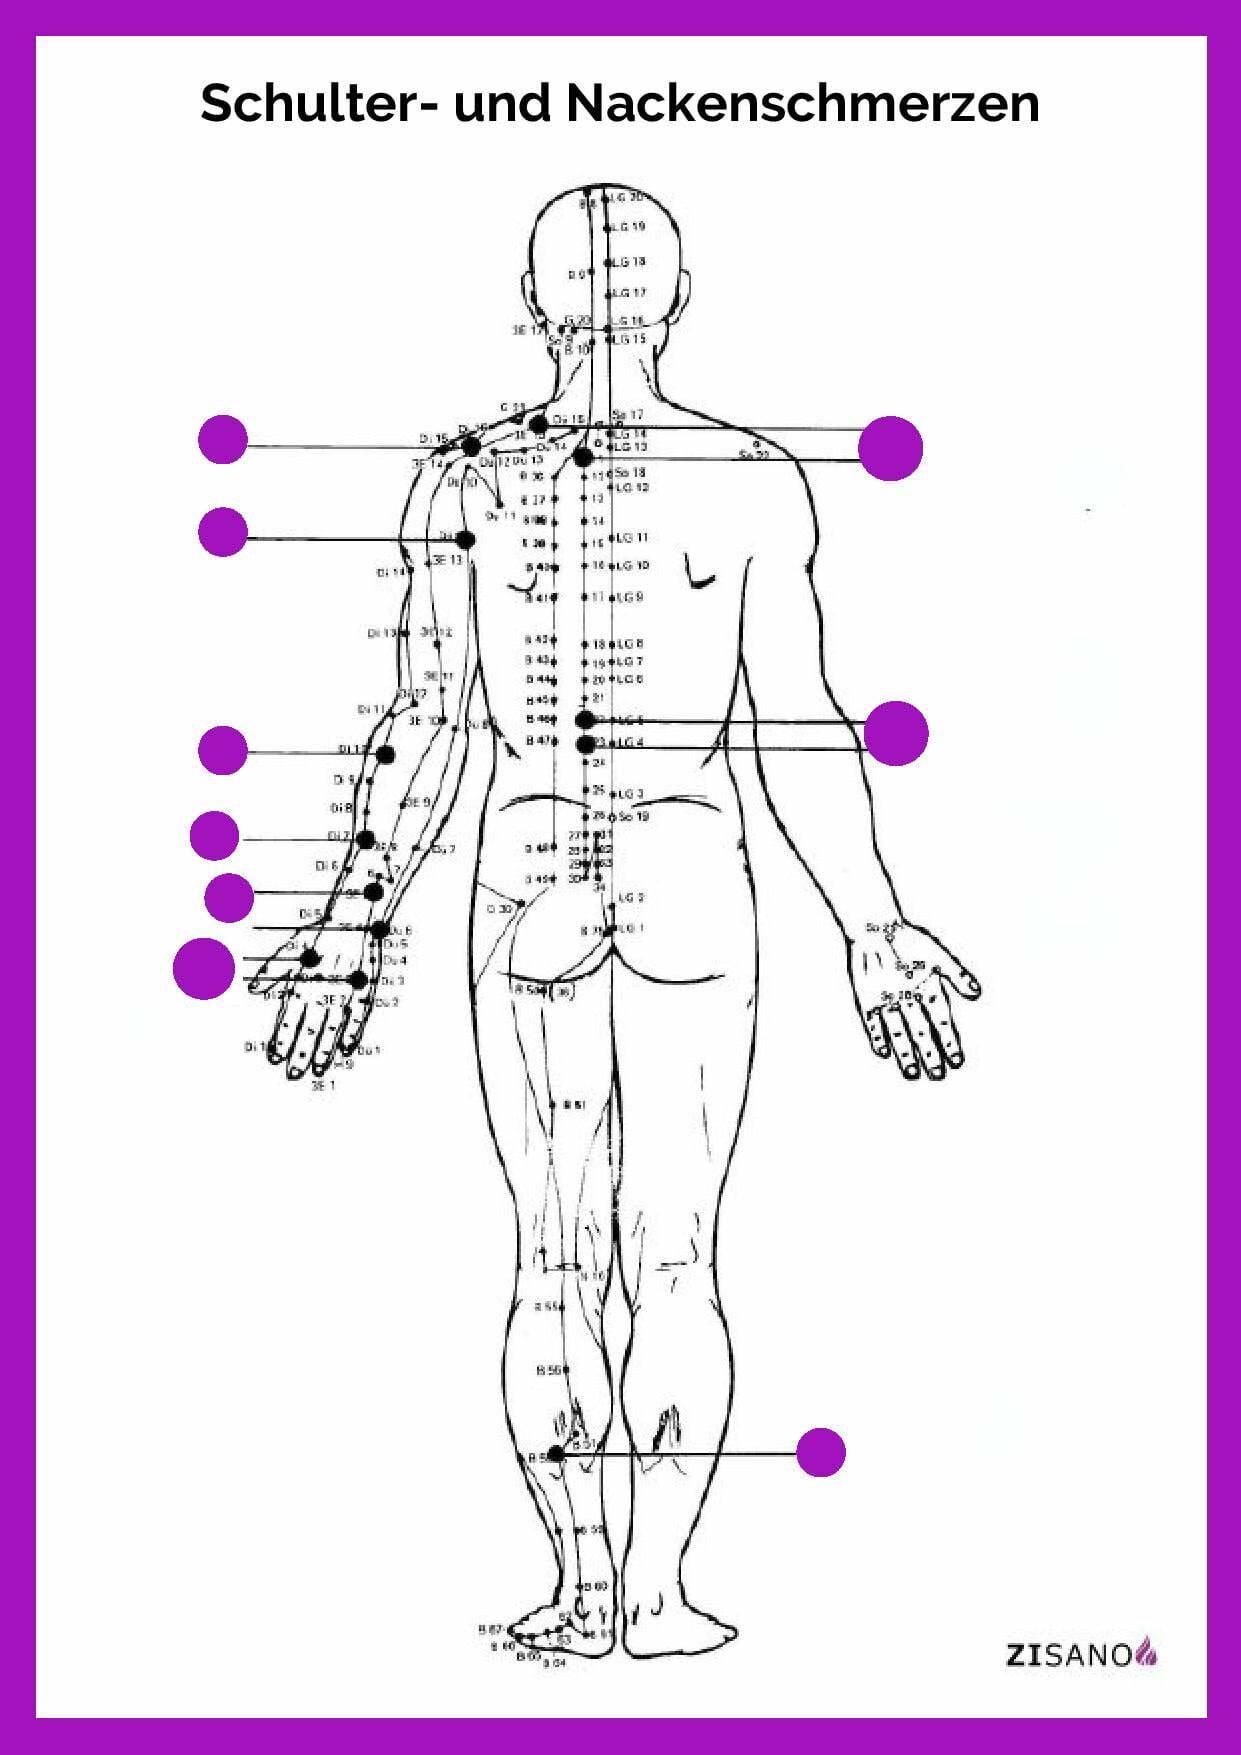 Meridiane - Schulterschmerzen - Nackenschmerzen - Beschwerden